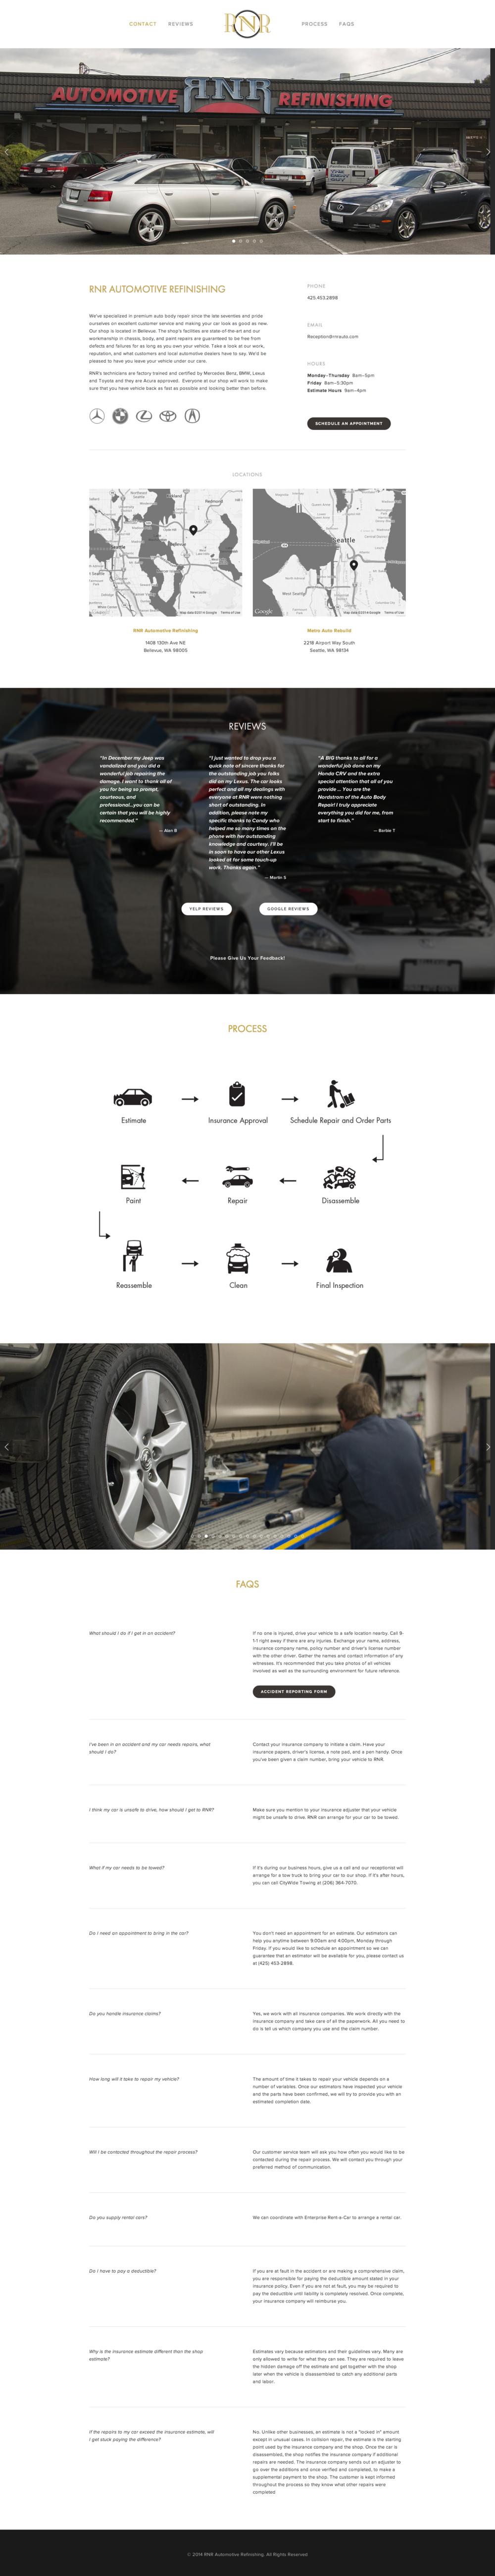 The new RNR Automotive Refinishing website